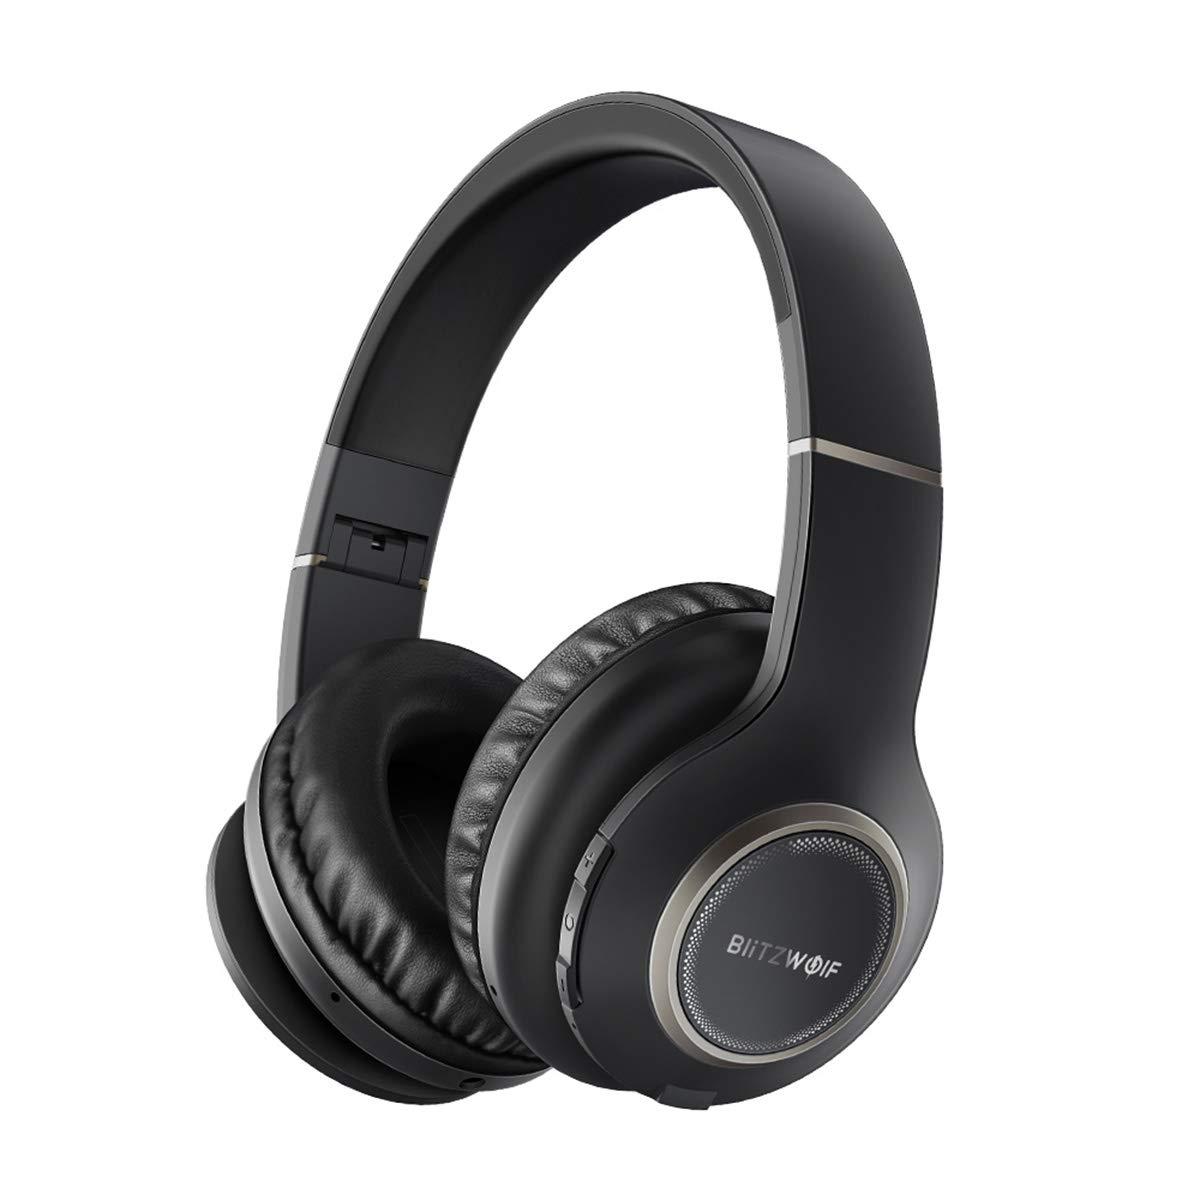 Wireless Headphones 20 Hrs Playtime